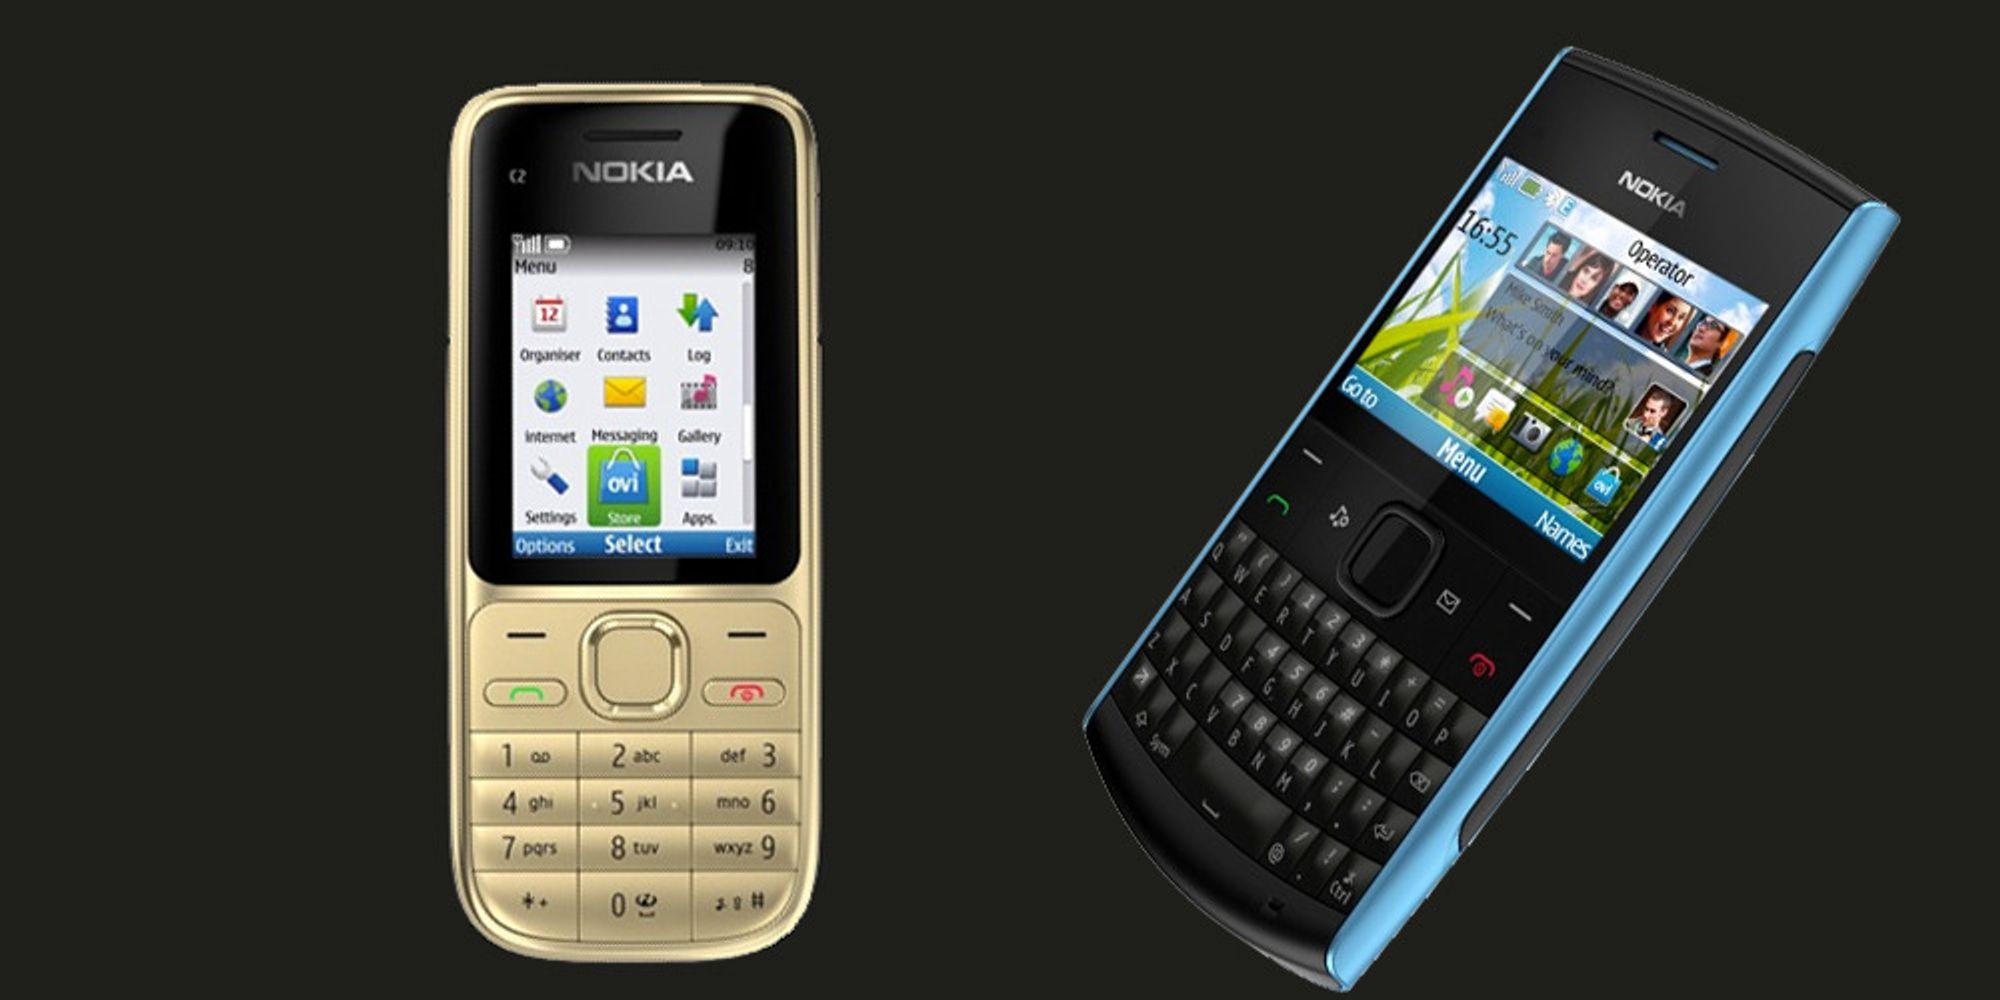 To nye Nokia-mobiler til under tusen kroner